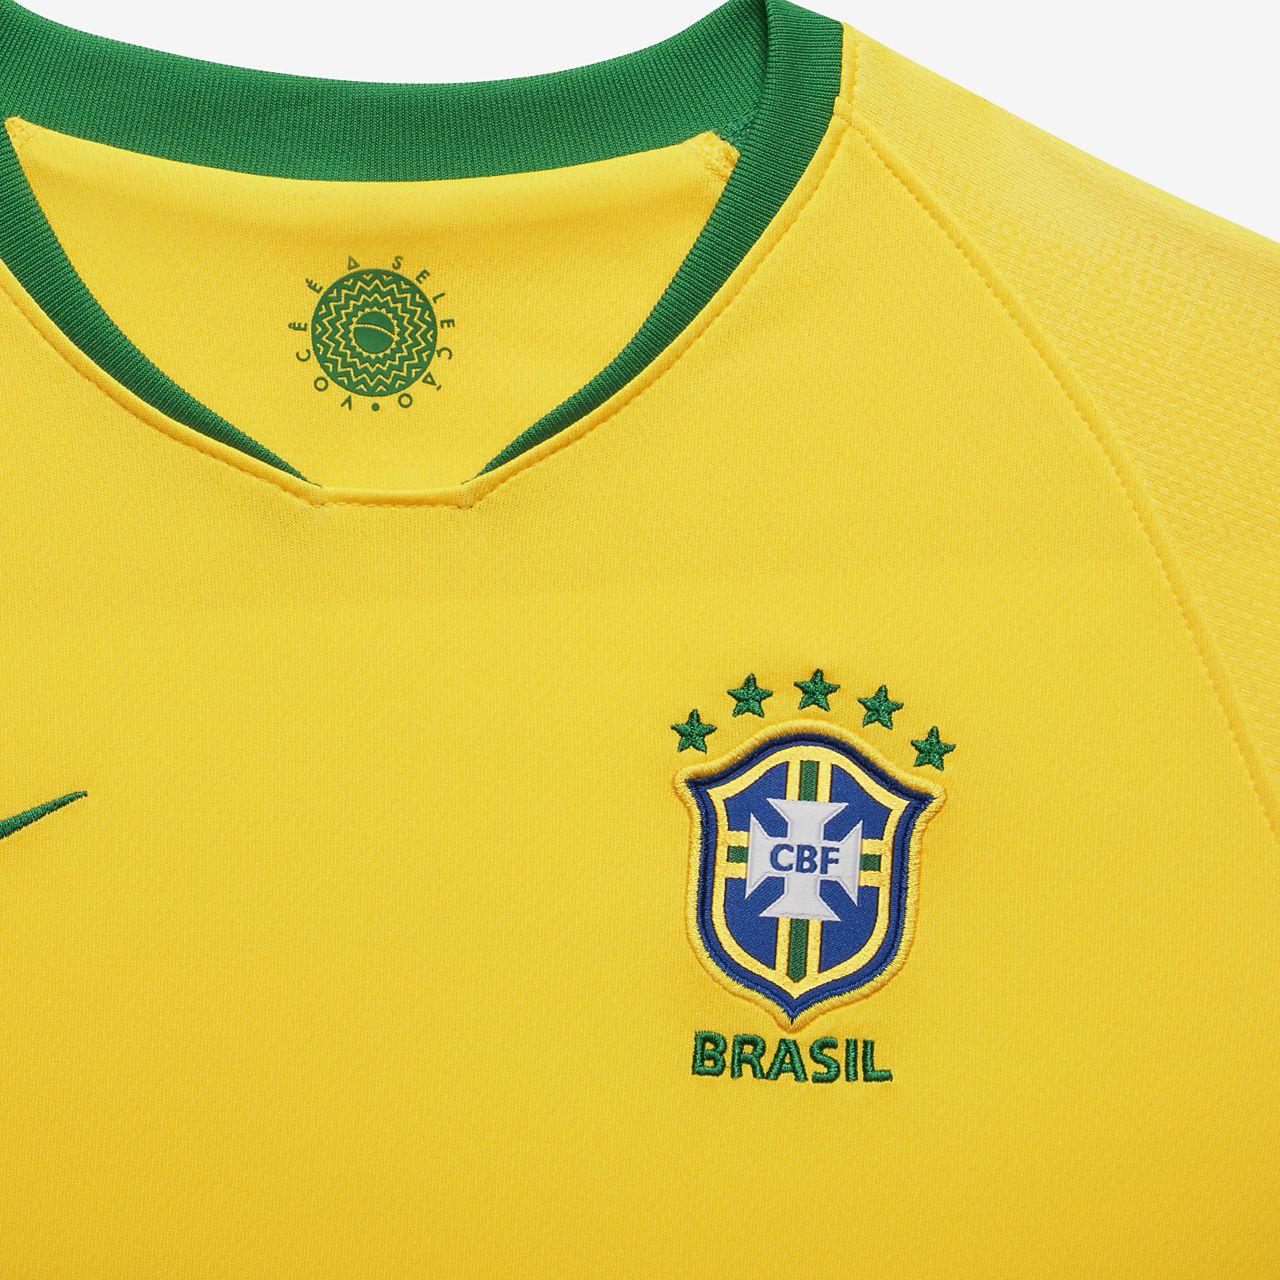 011f97da6b ... Uniforme de fútbol para niños talla pequeña 2018 Brasil CBF Stadium Home